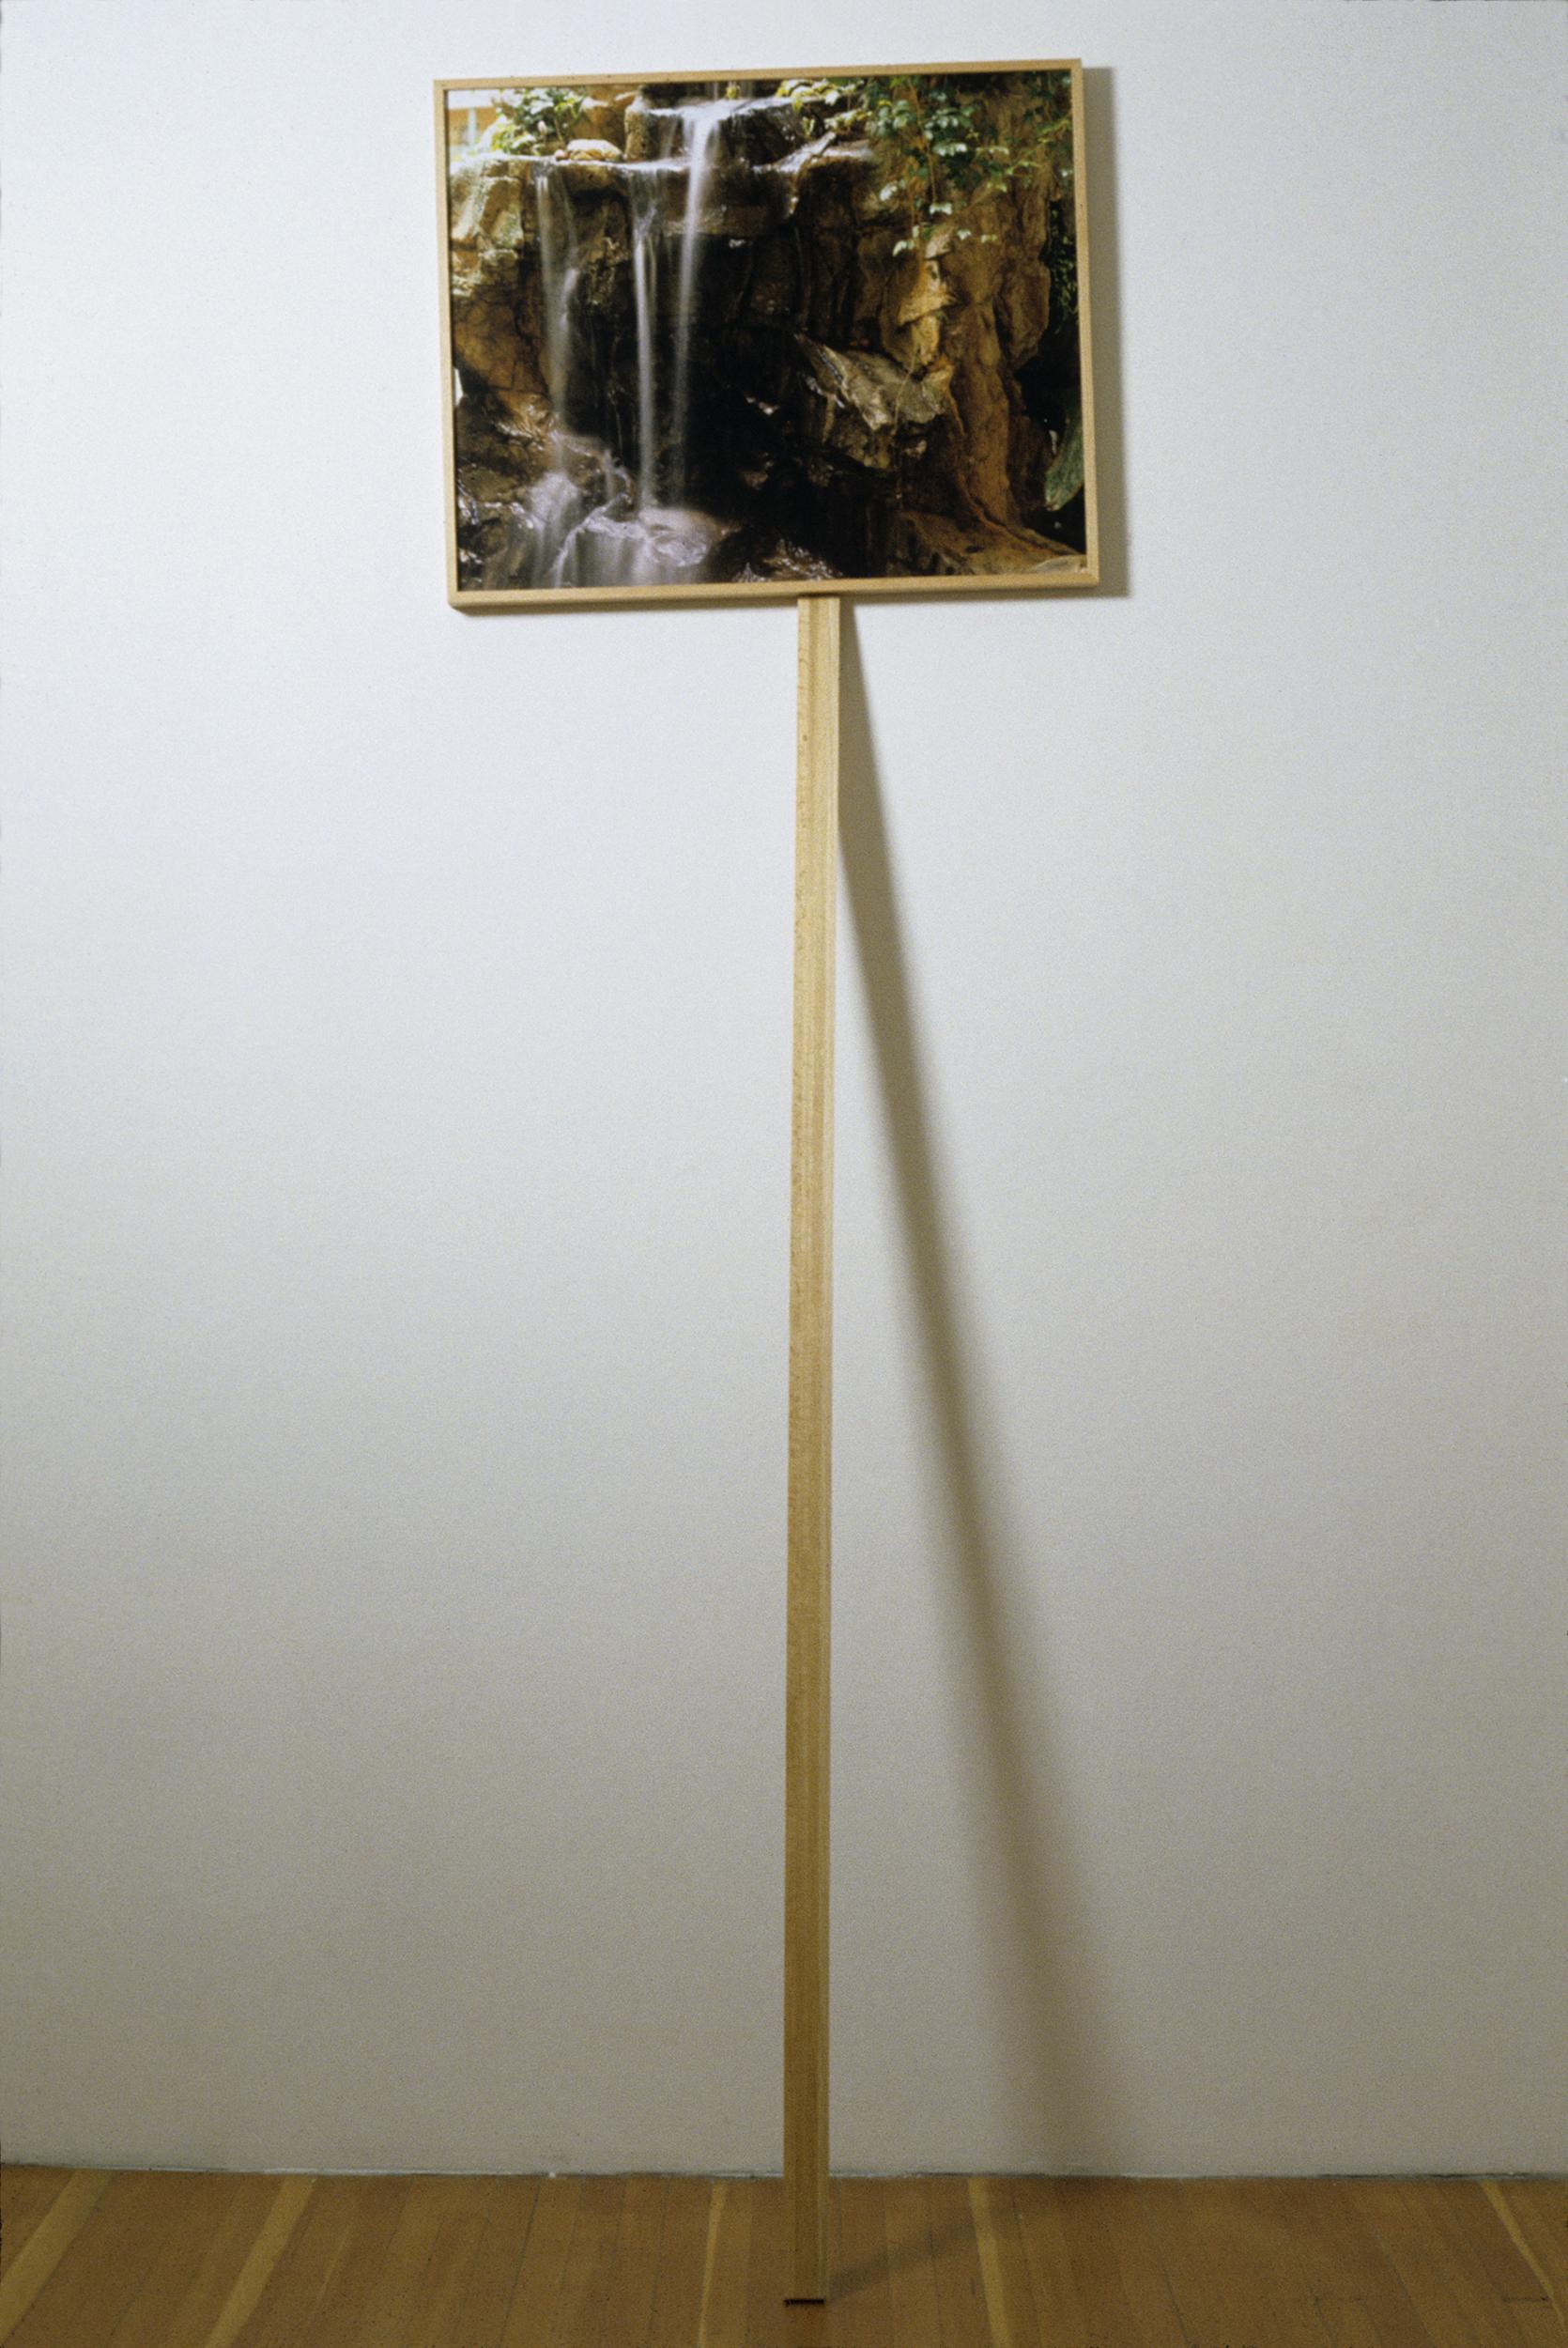 Unfolding 2007 chromogenic print on acrylic with oak frame and post